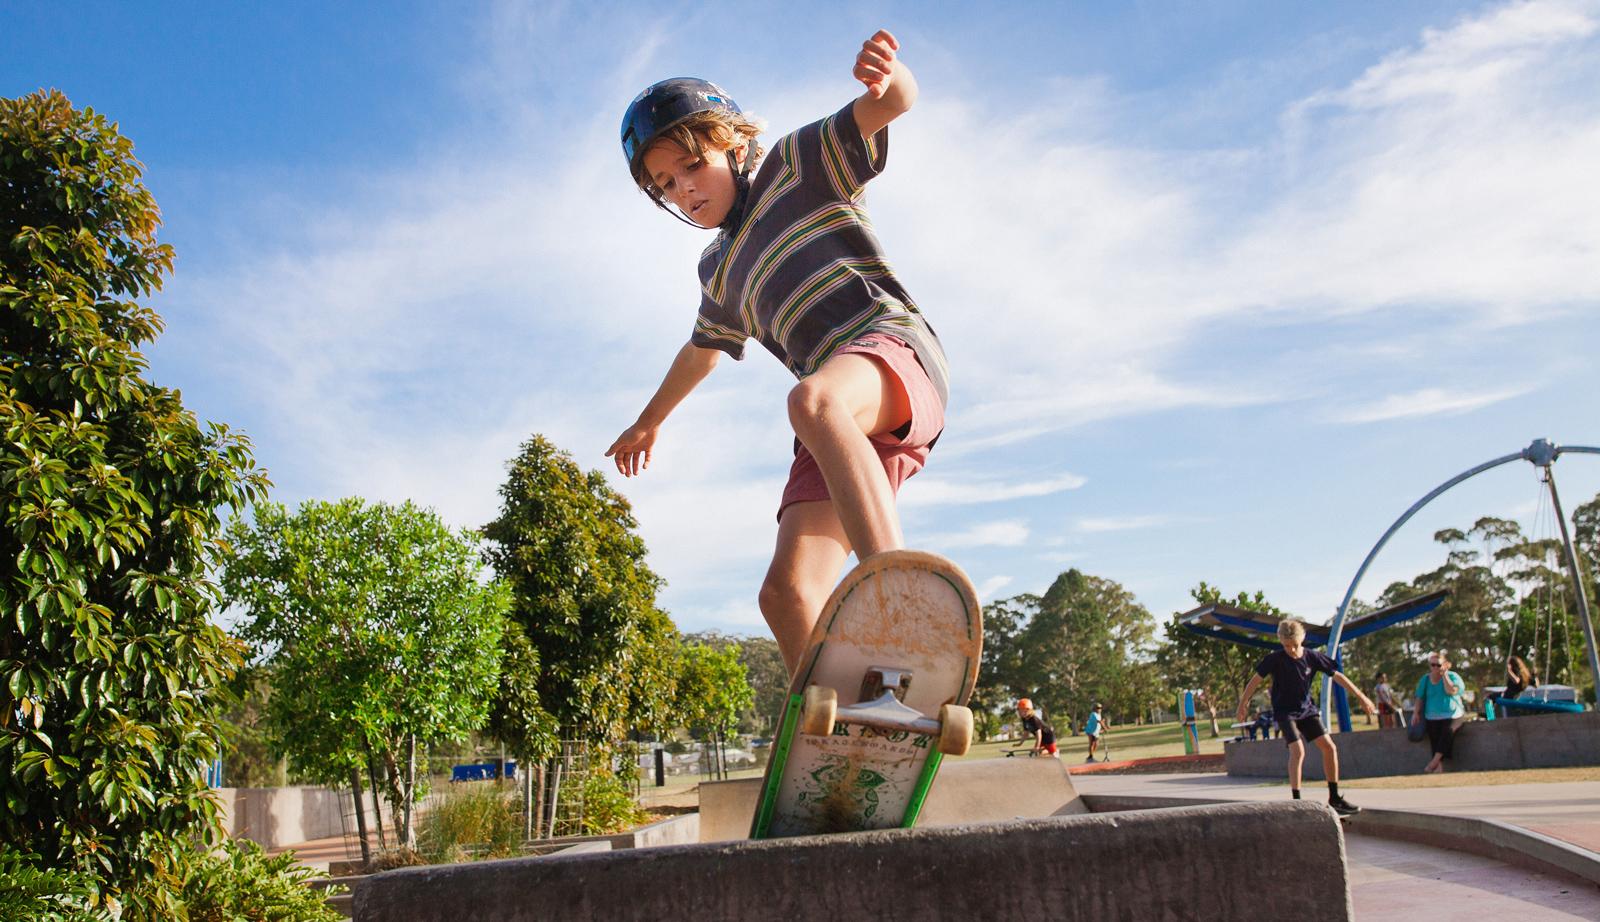 Gusto skateboarding